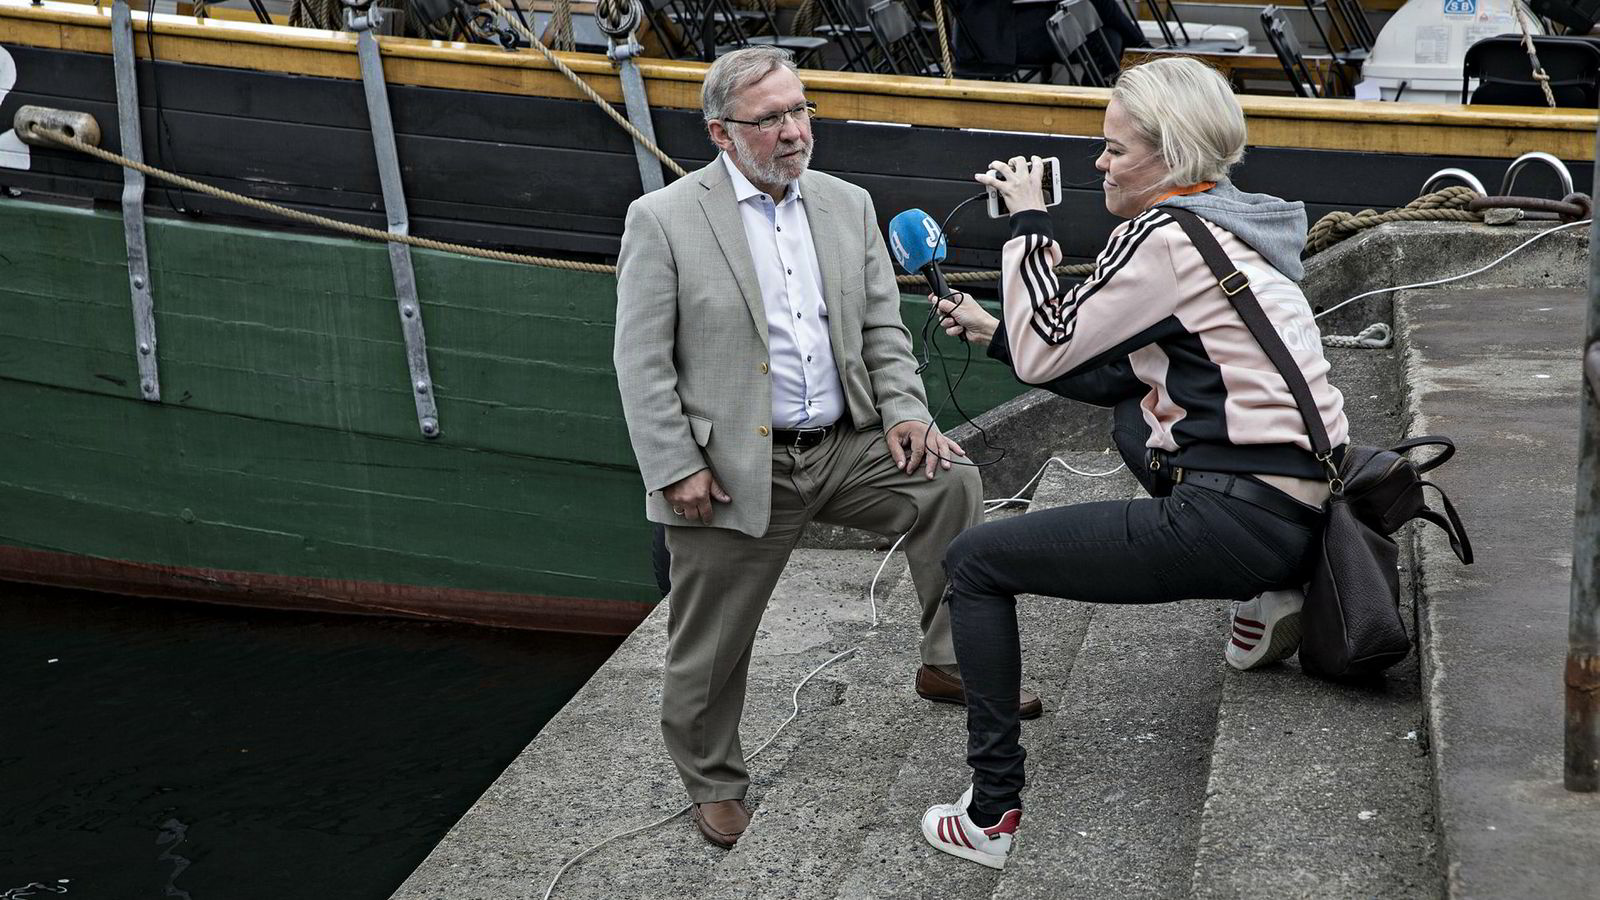 Harald Stanghelle sammen med Aftenposten-journalist Ingeborg Senneset under Arendalsuka.